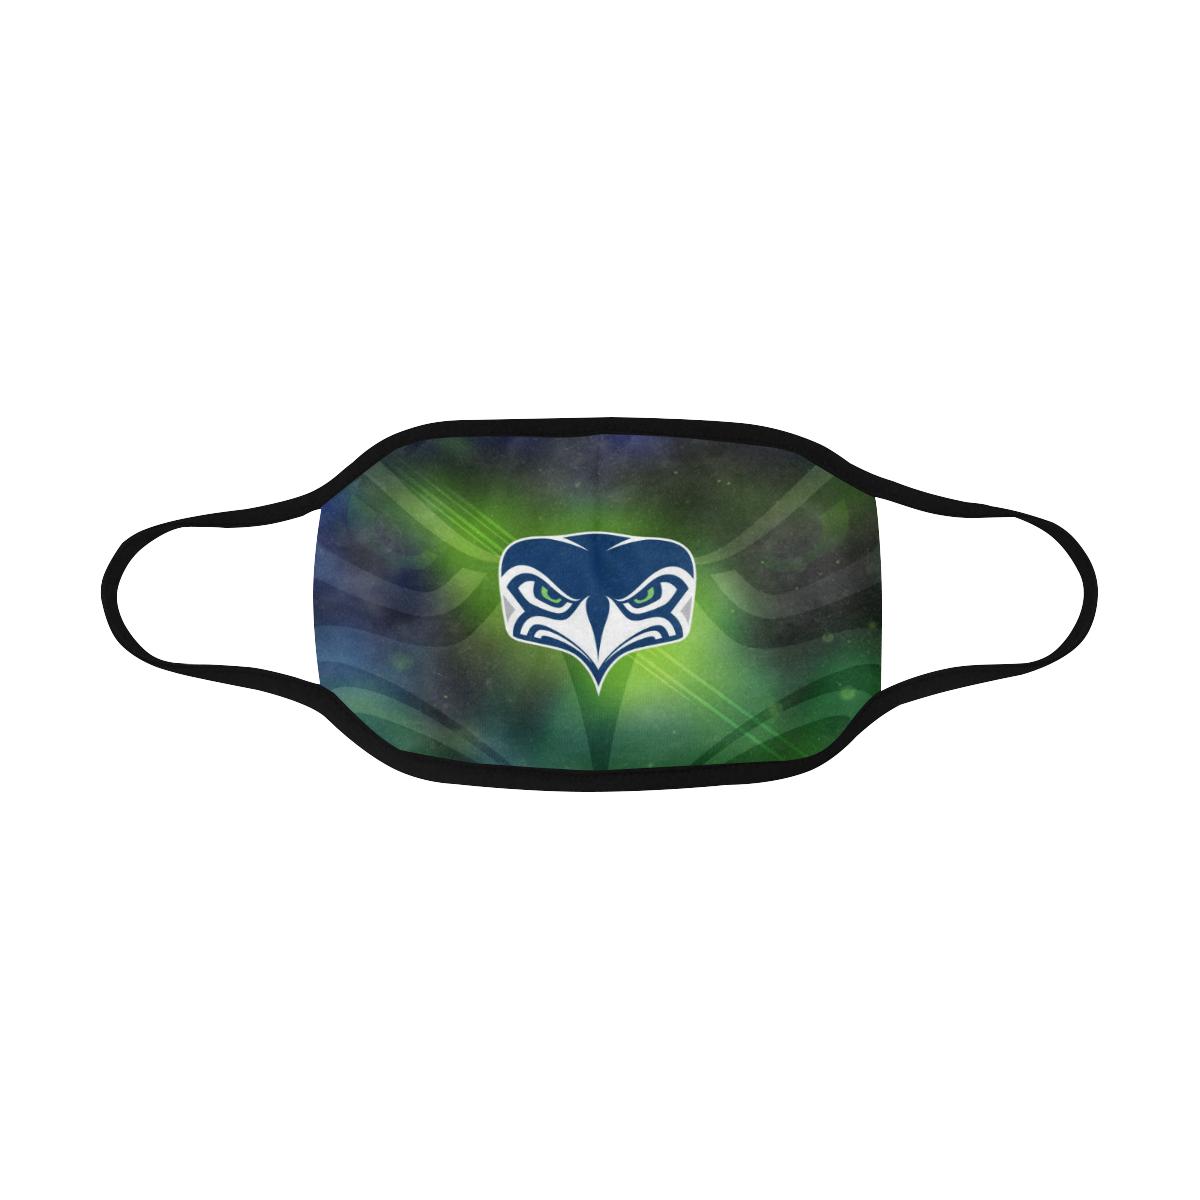 Seattle Seahawks Face Mask - Adults Mask PM2.5